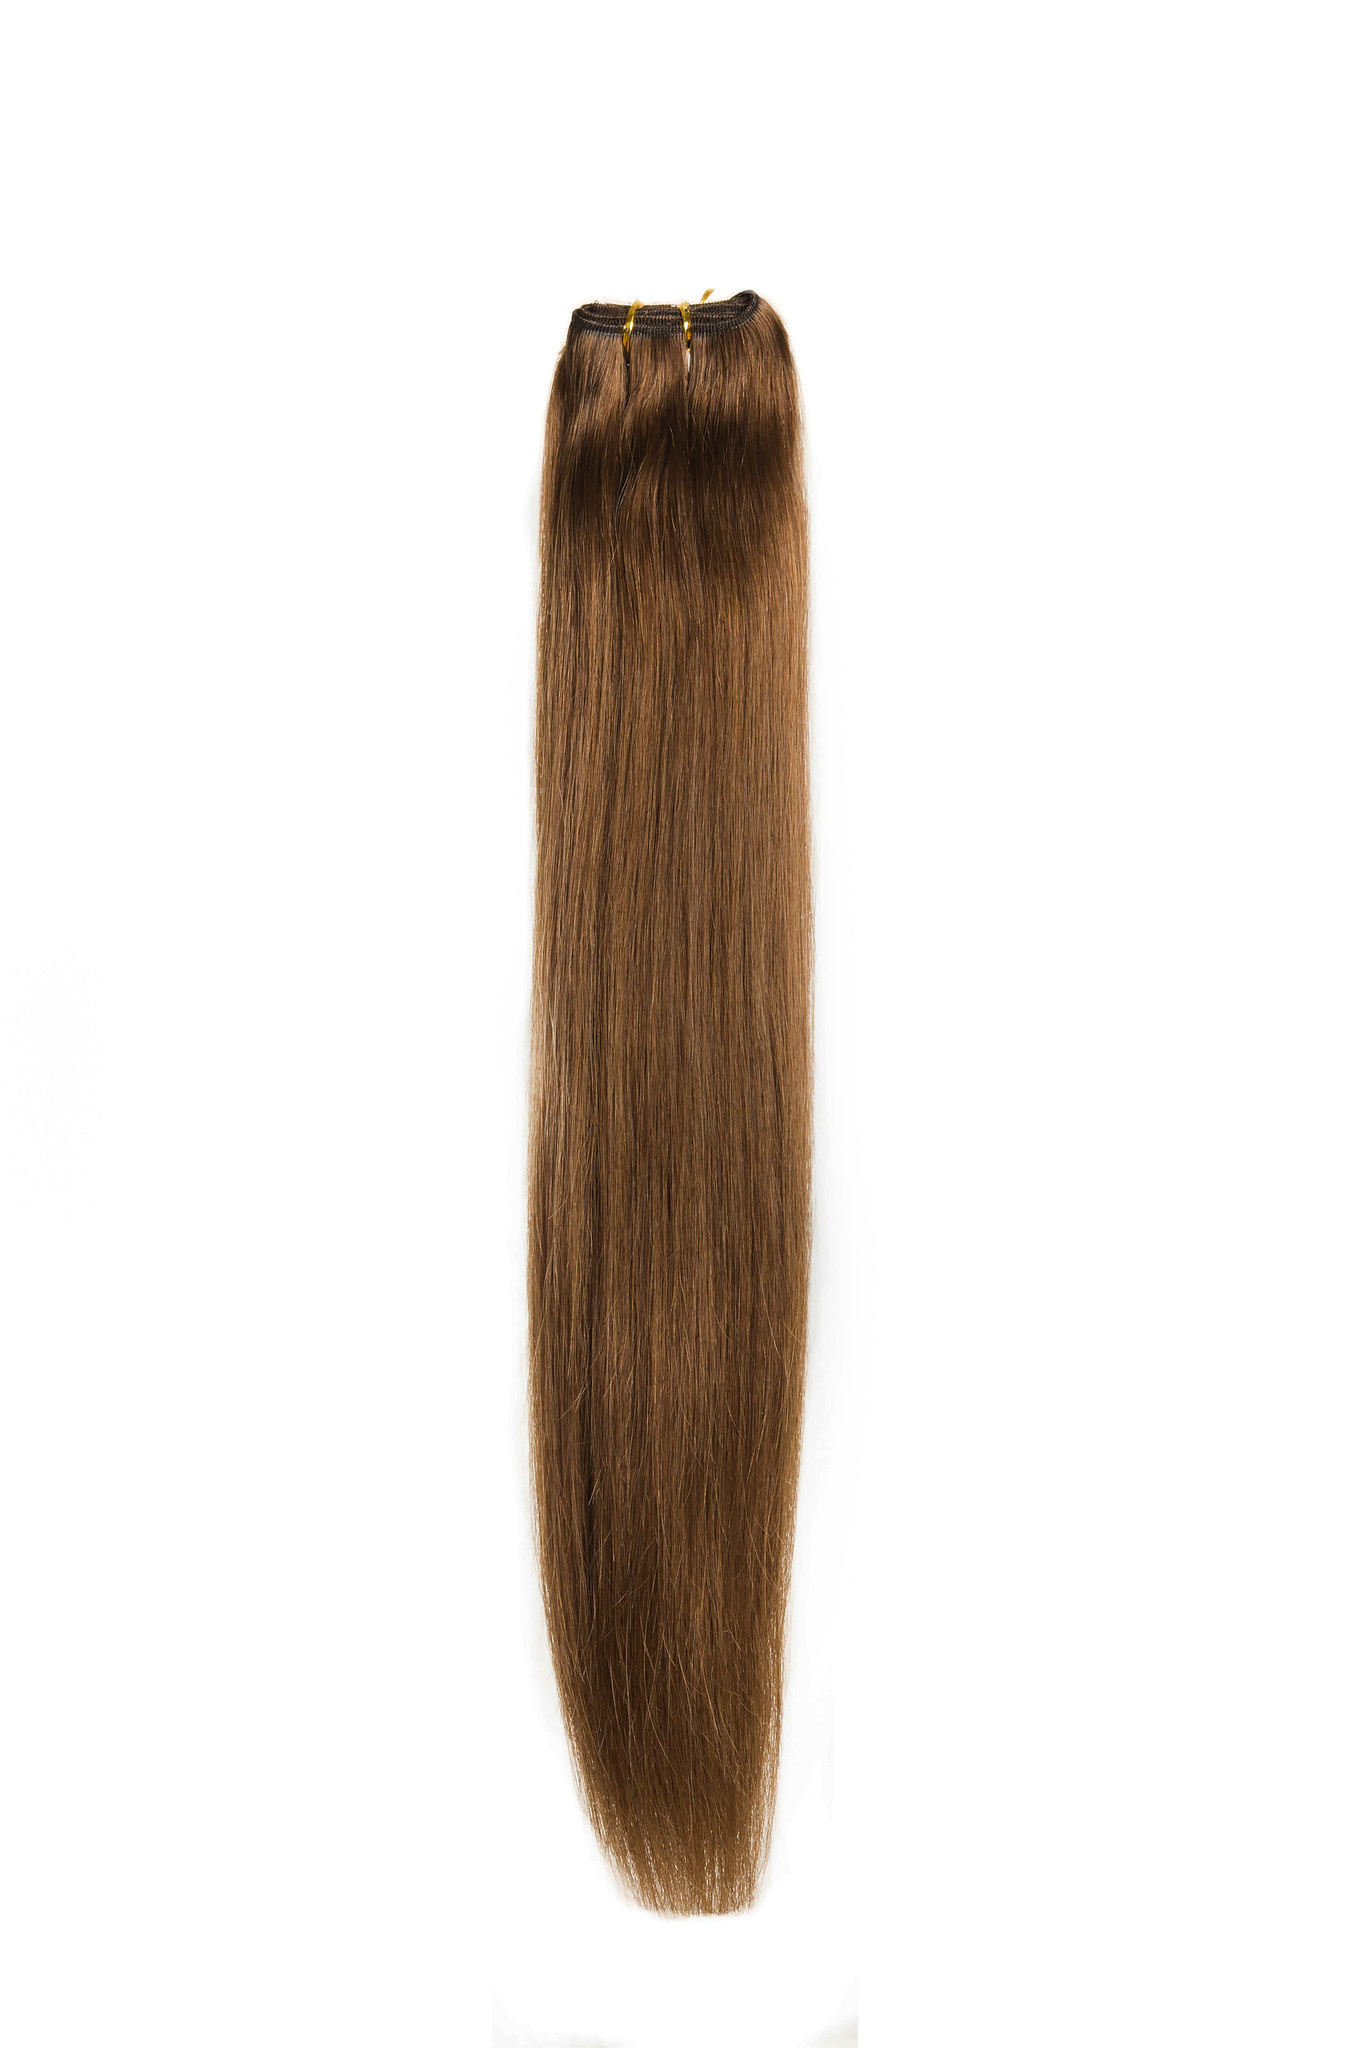 RedFox Weave - #12 Ash Blonde